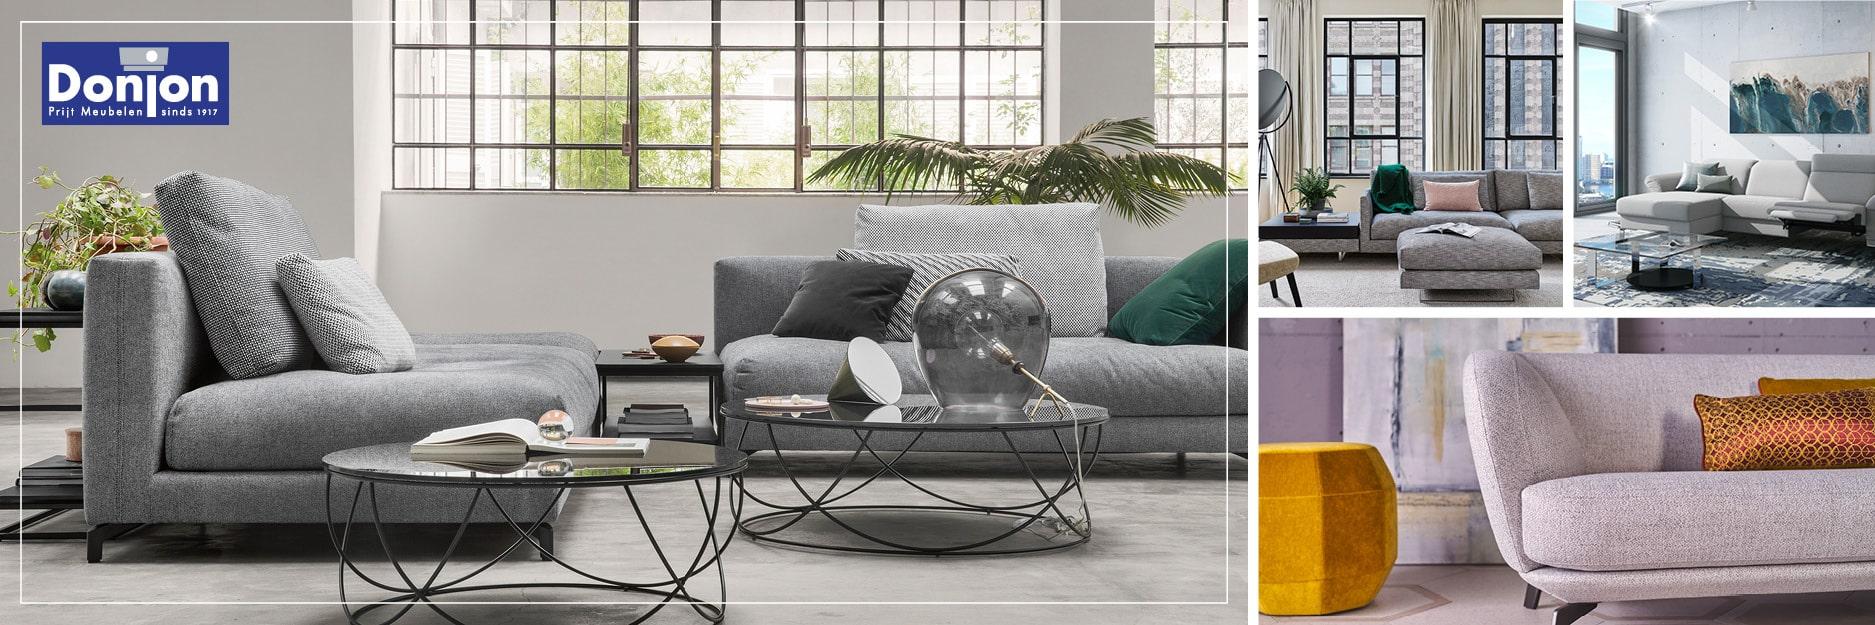 Wonen-meubels-Eindhoven header